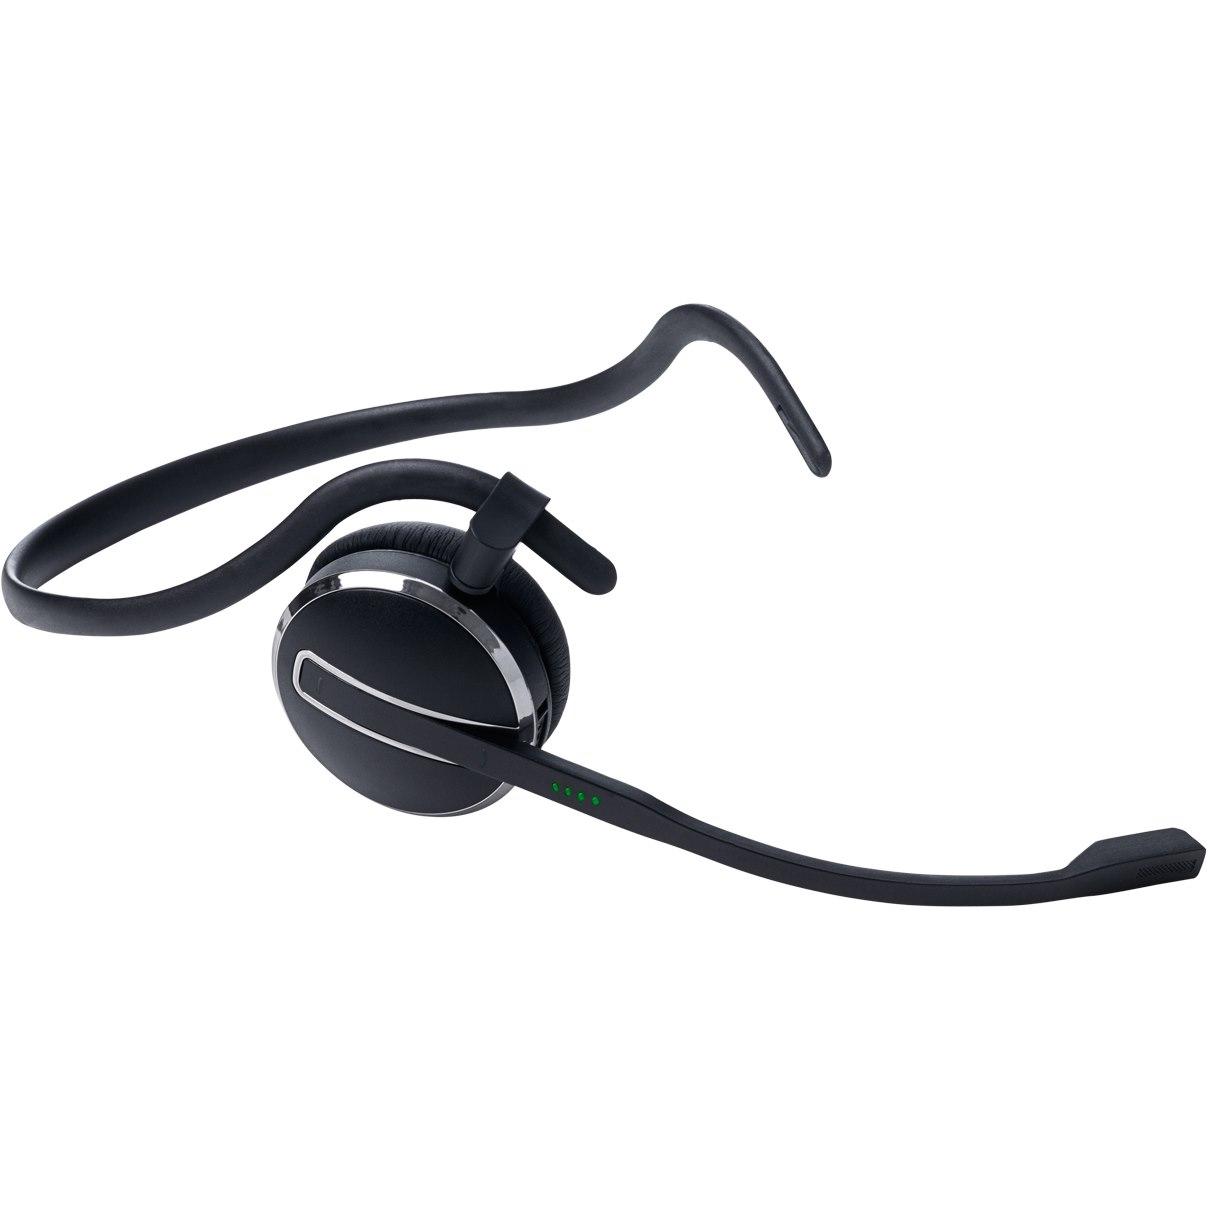 Jabra PRO 9460 Wireless DECT Mono Headset - Over-the-head - Supra-aural